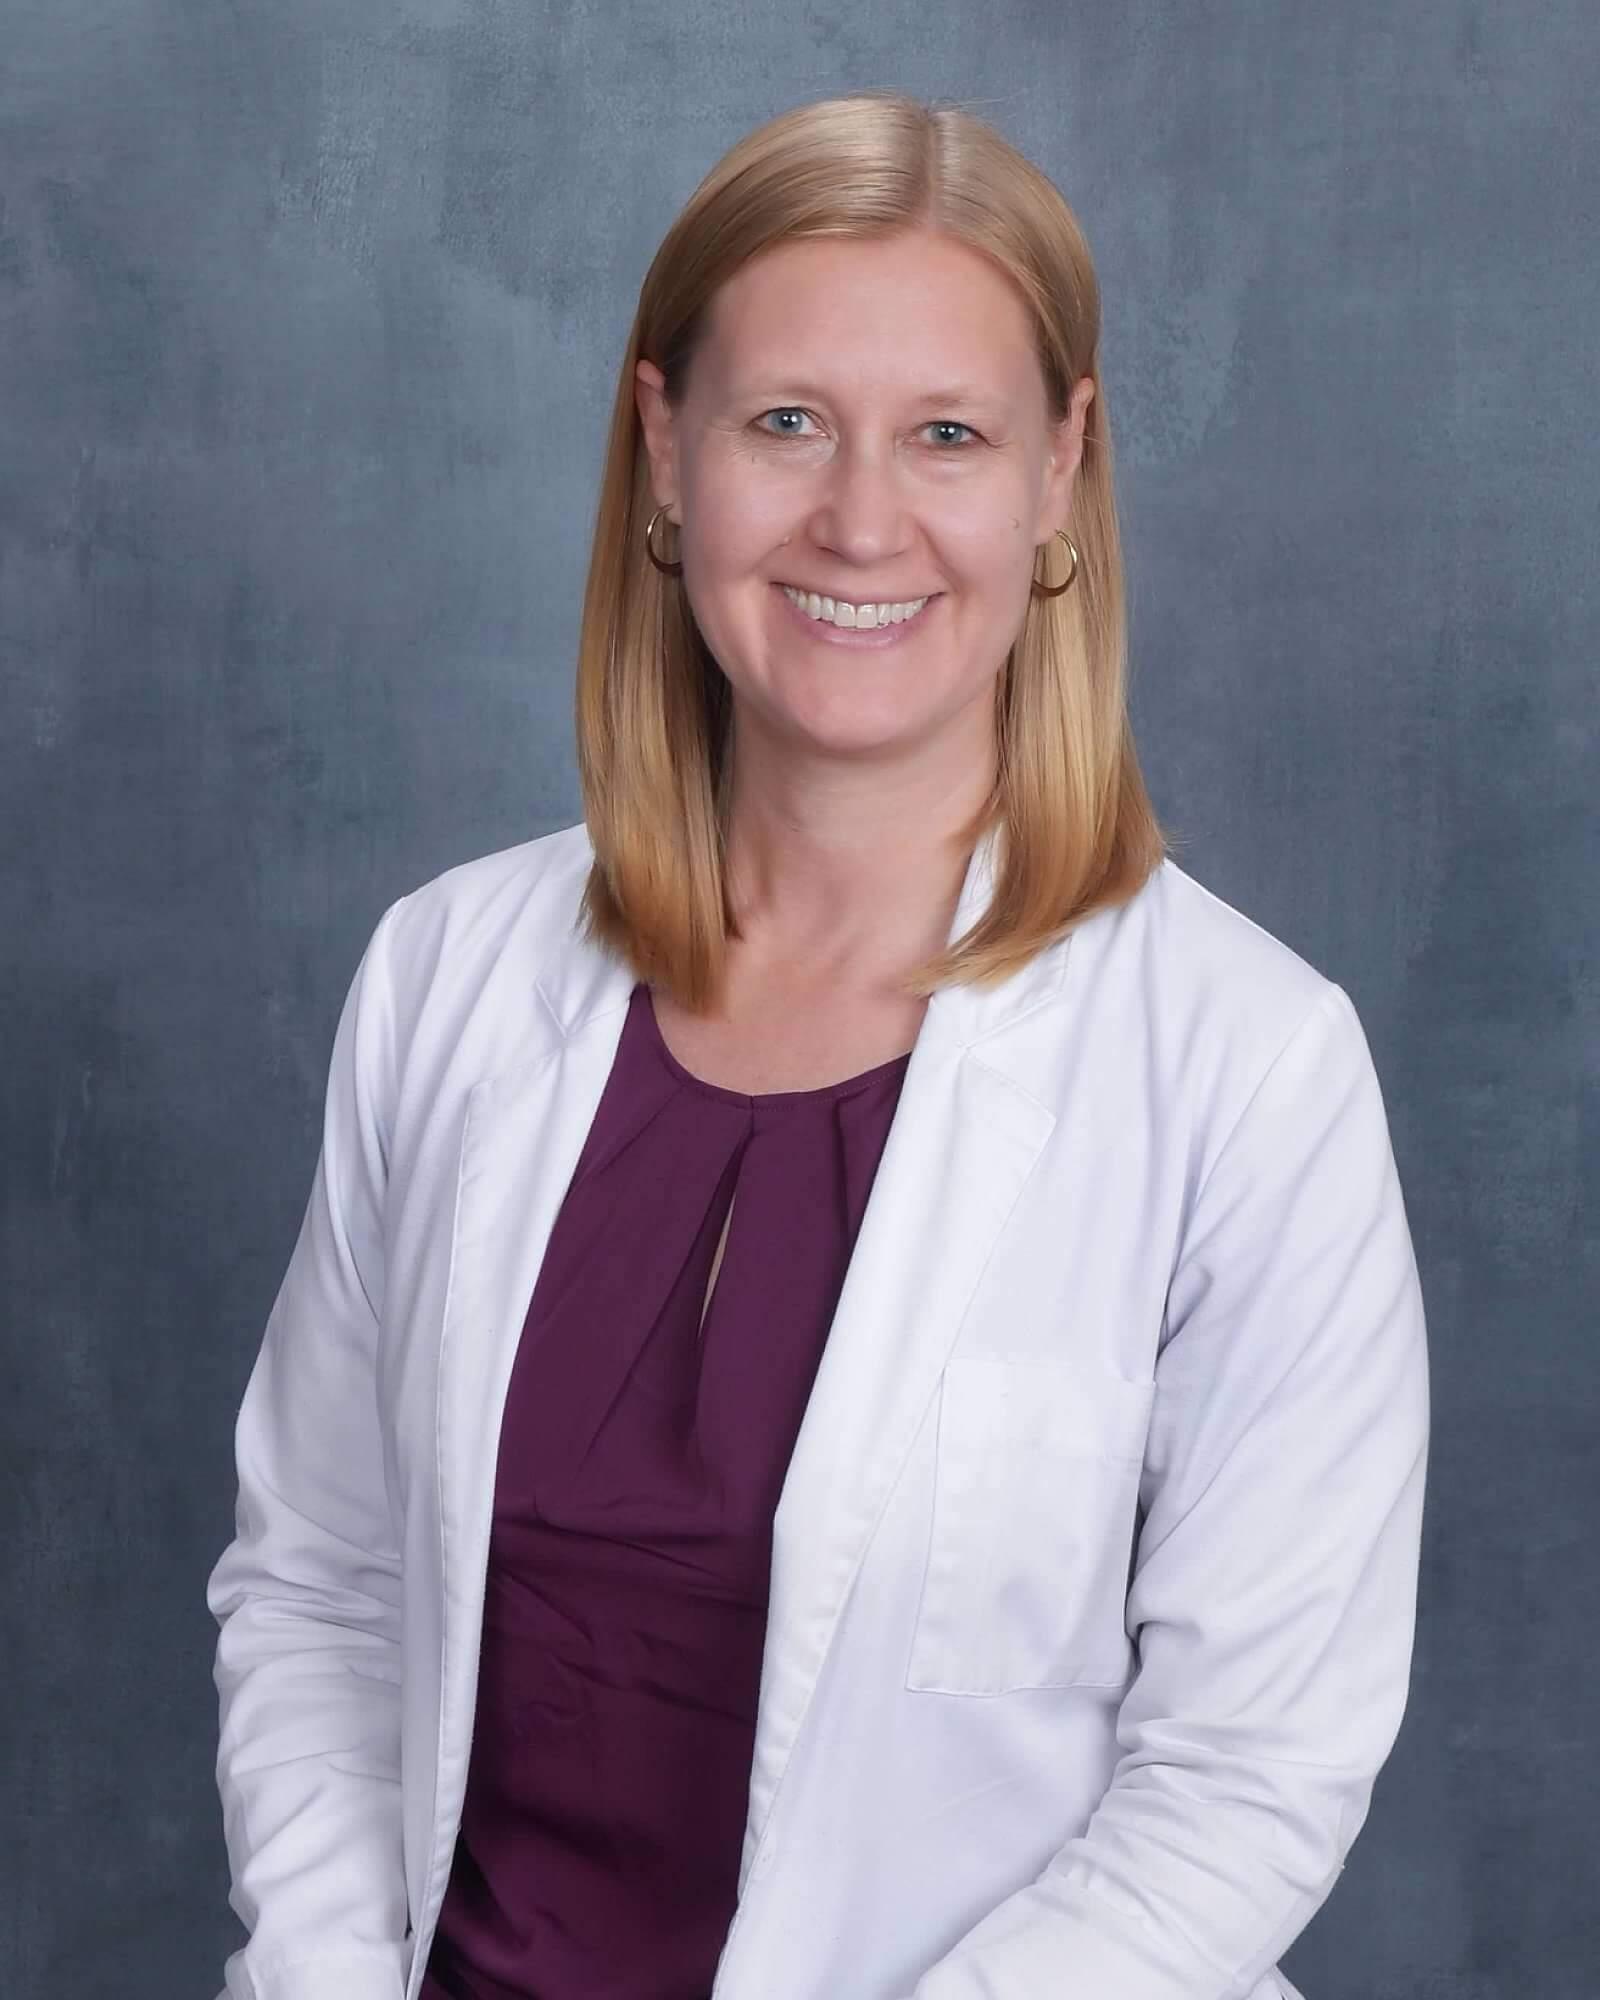 Doctor Kendra Ott - Optometrist